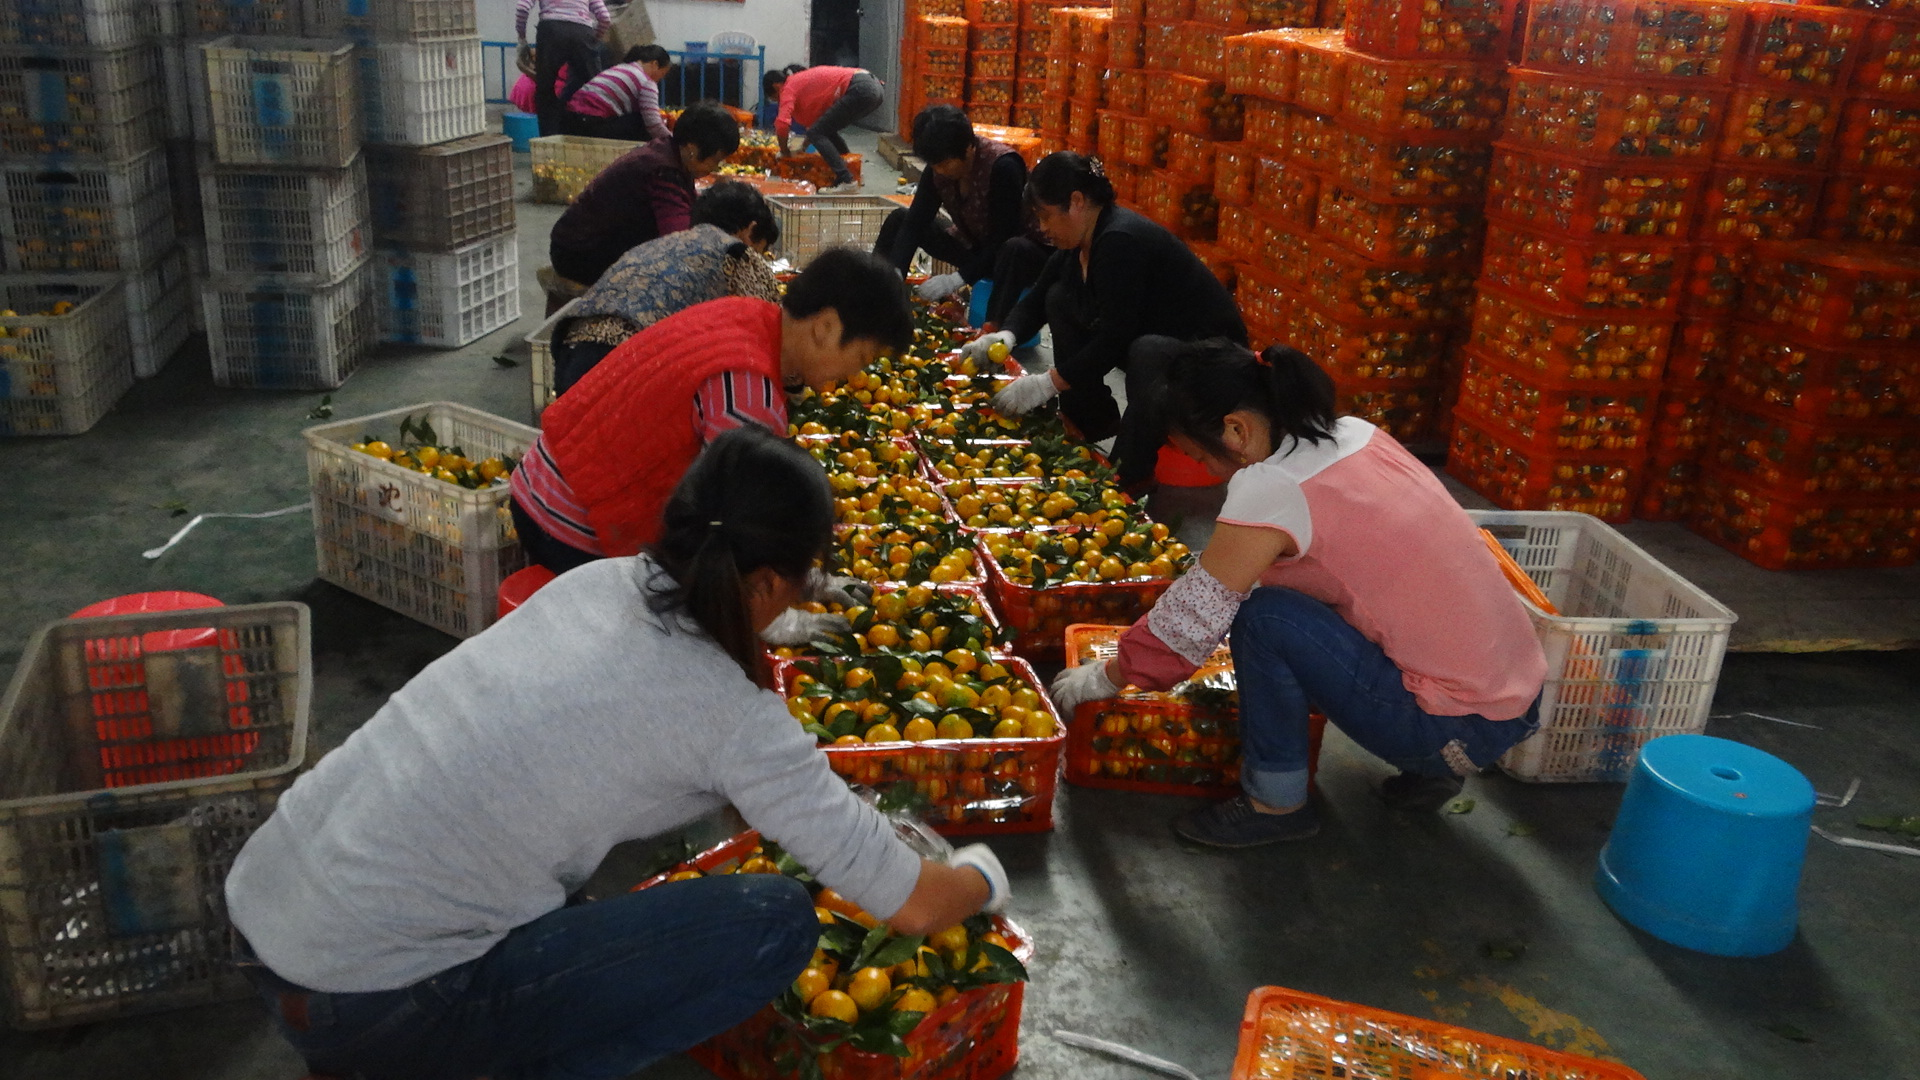 Могут ли мандарины являться переносчиками гриппа?